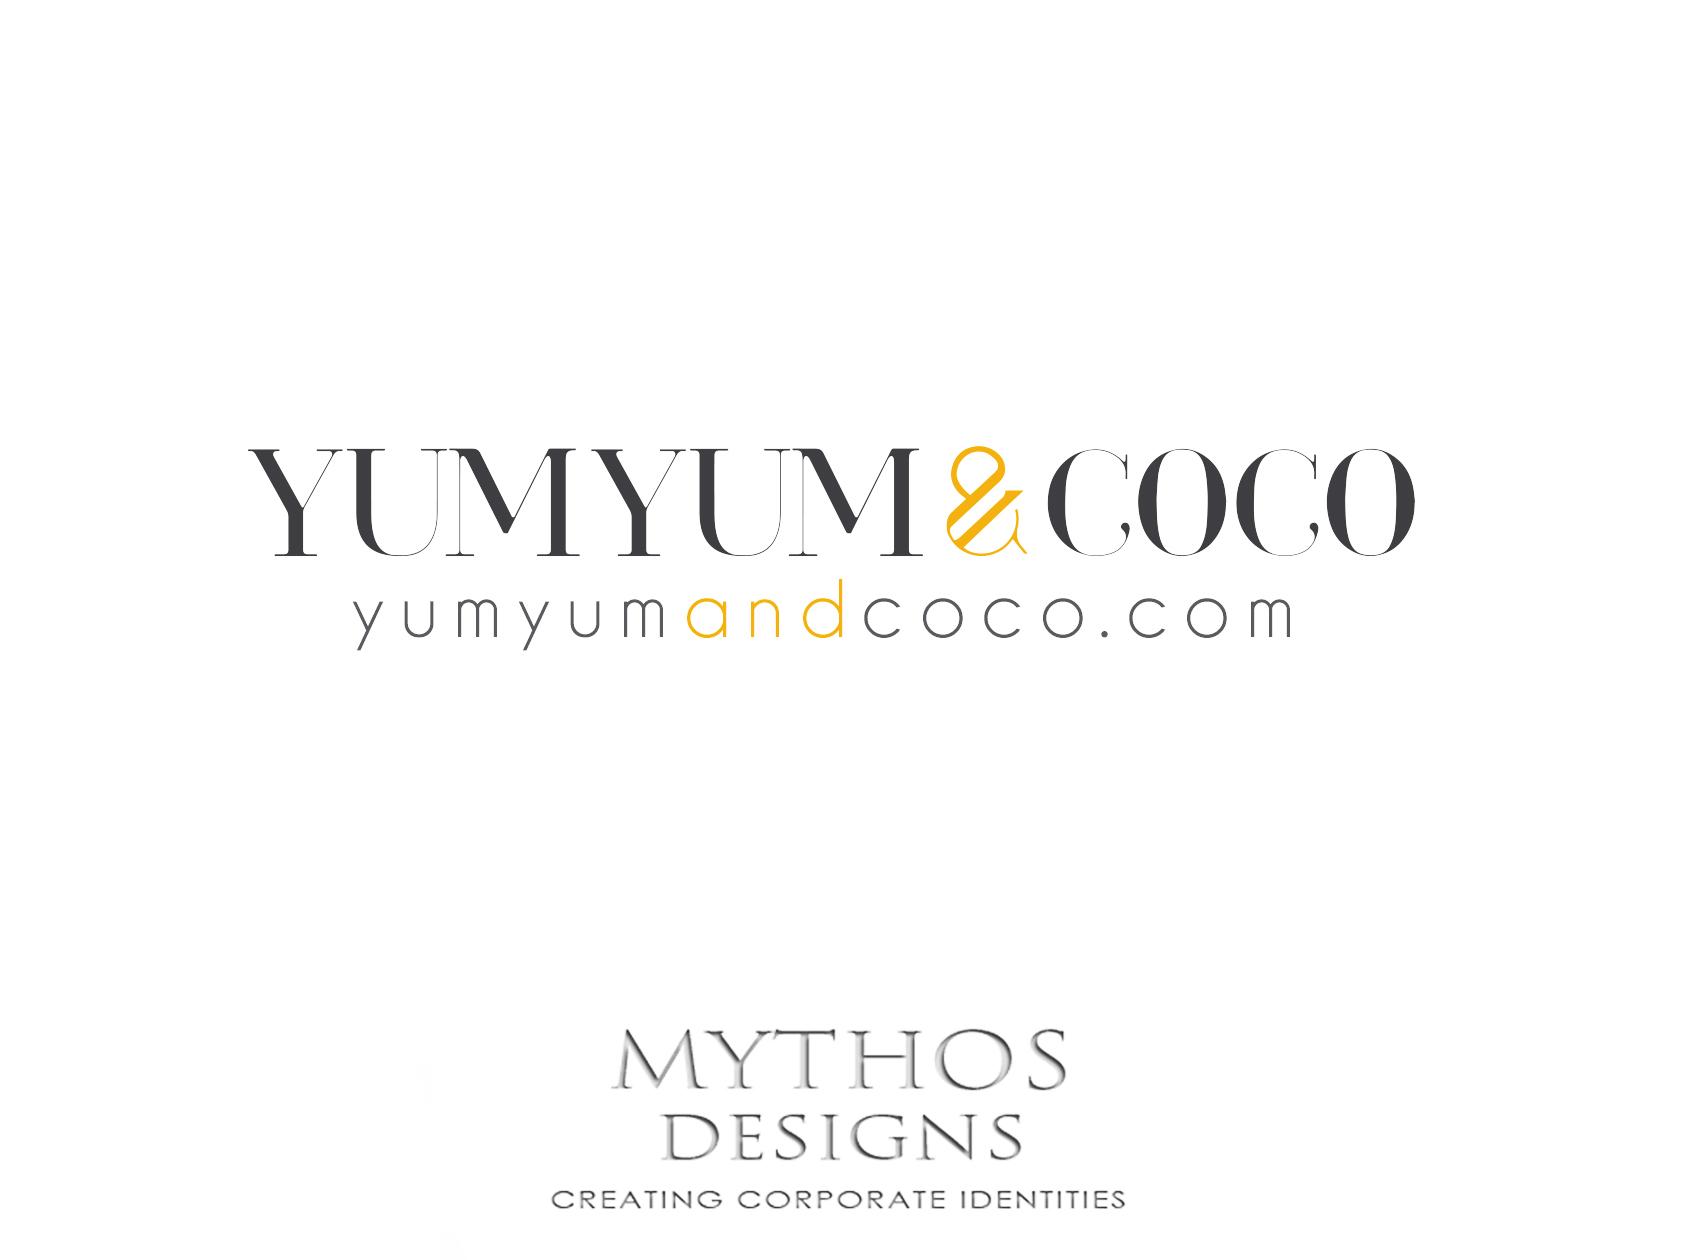 Logo Design by Mythos Designs - Entry No. 92 in the Logo Design Contest Logo Design for YumYum & CoCo.